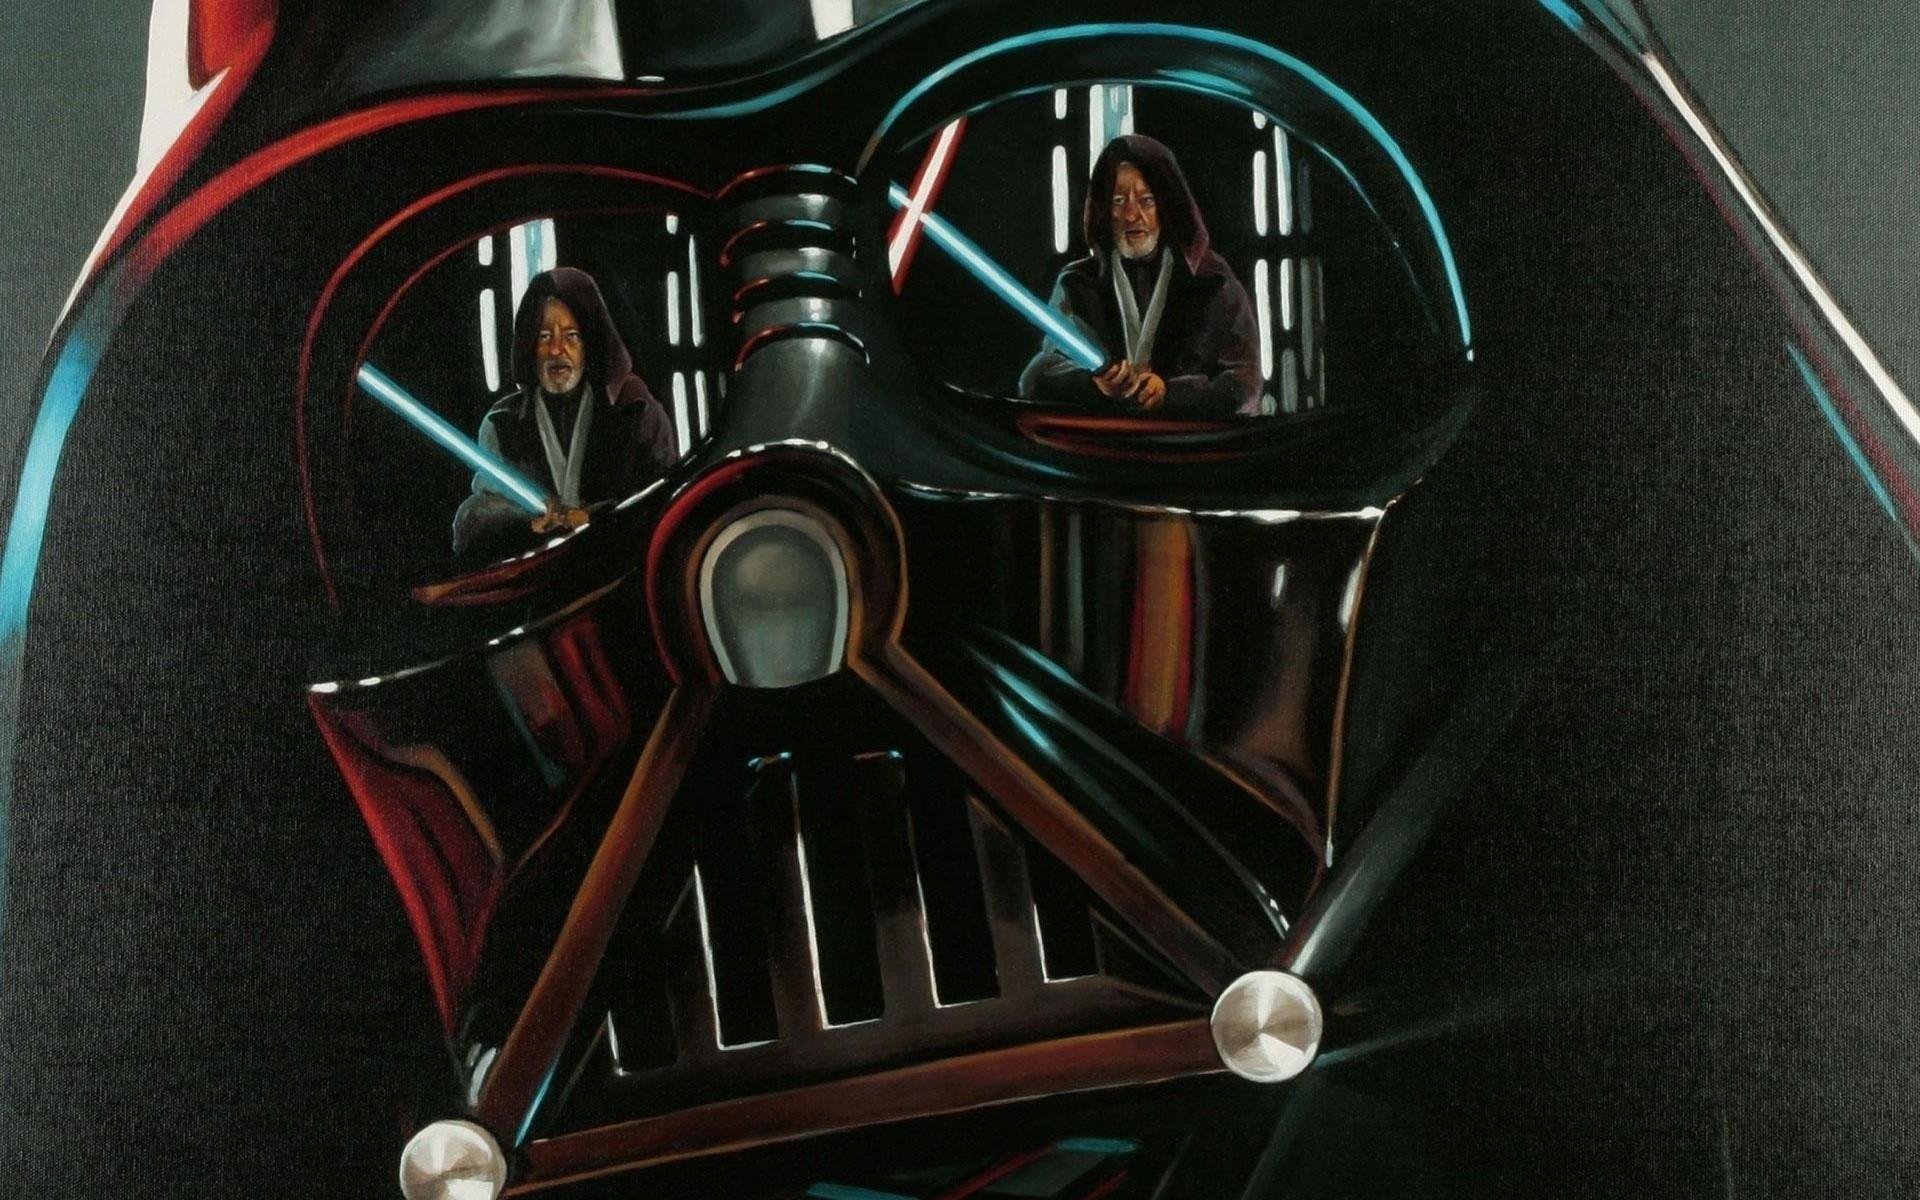 Star Wars Obi Wan vs Darth Vader Original Star Wars Darth Vader Obi-wan